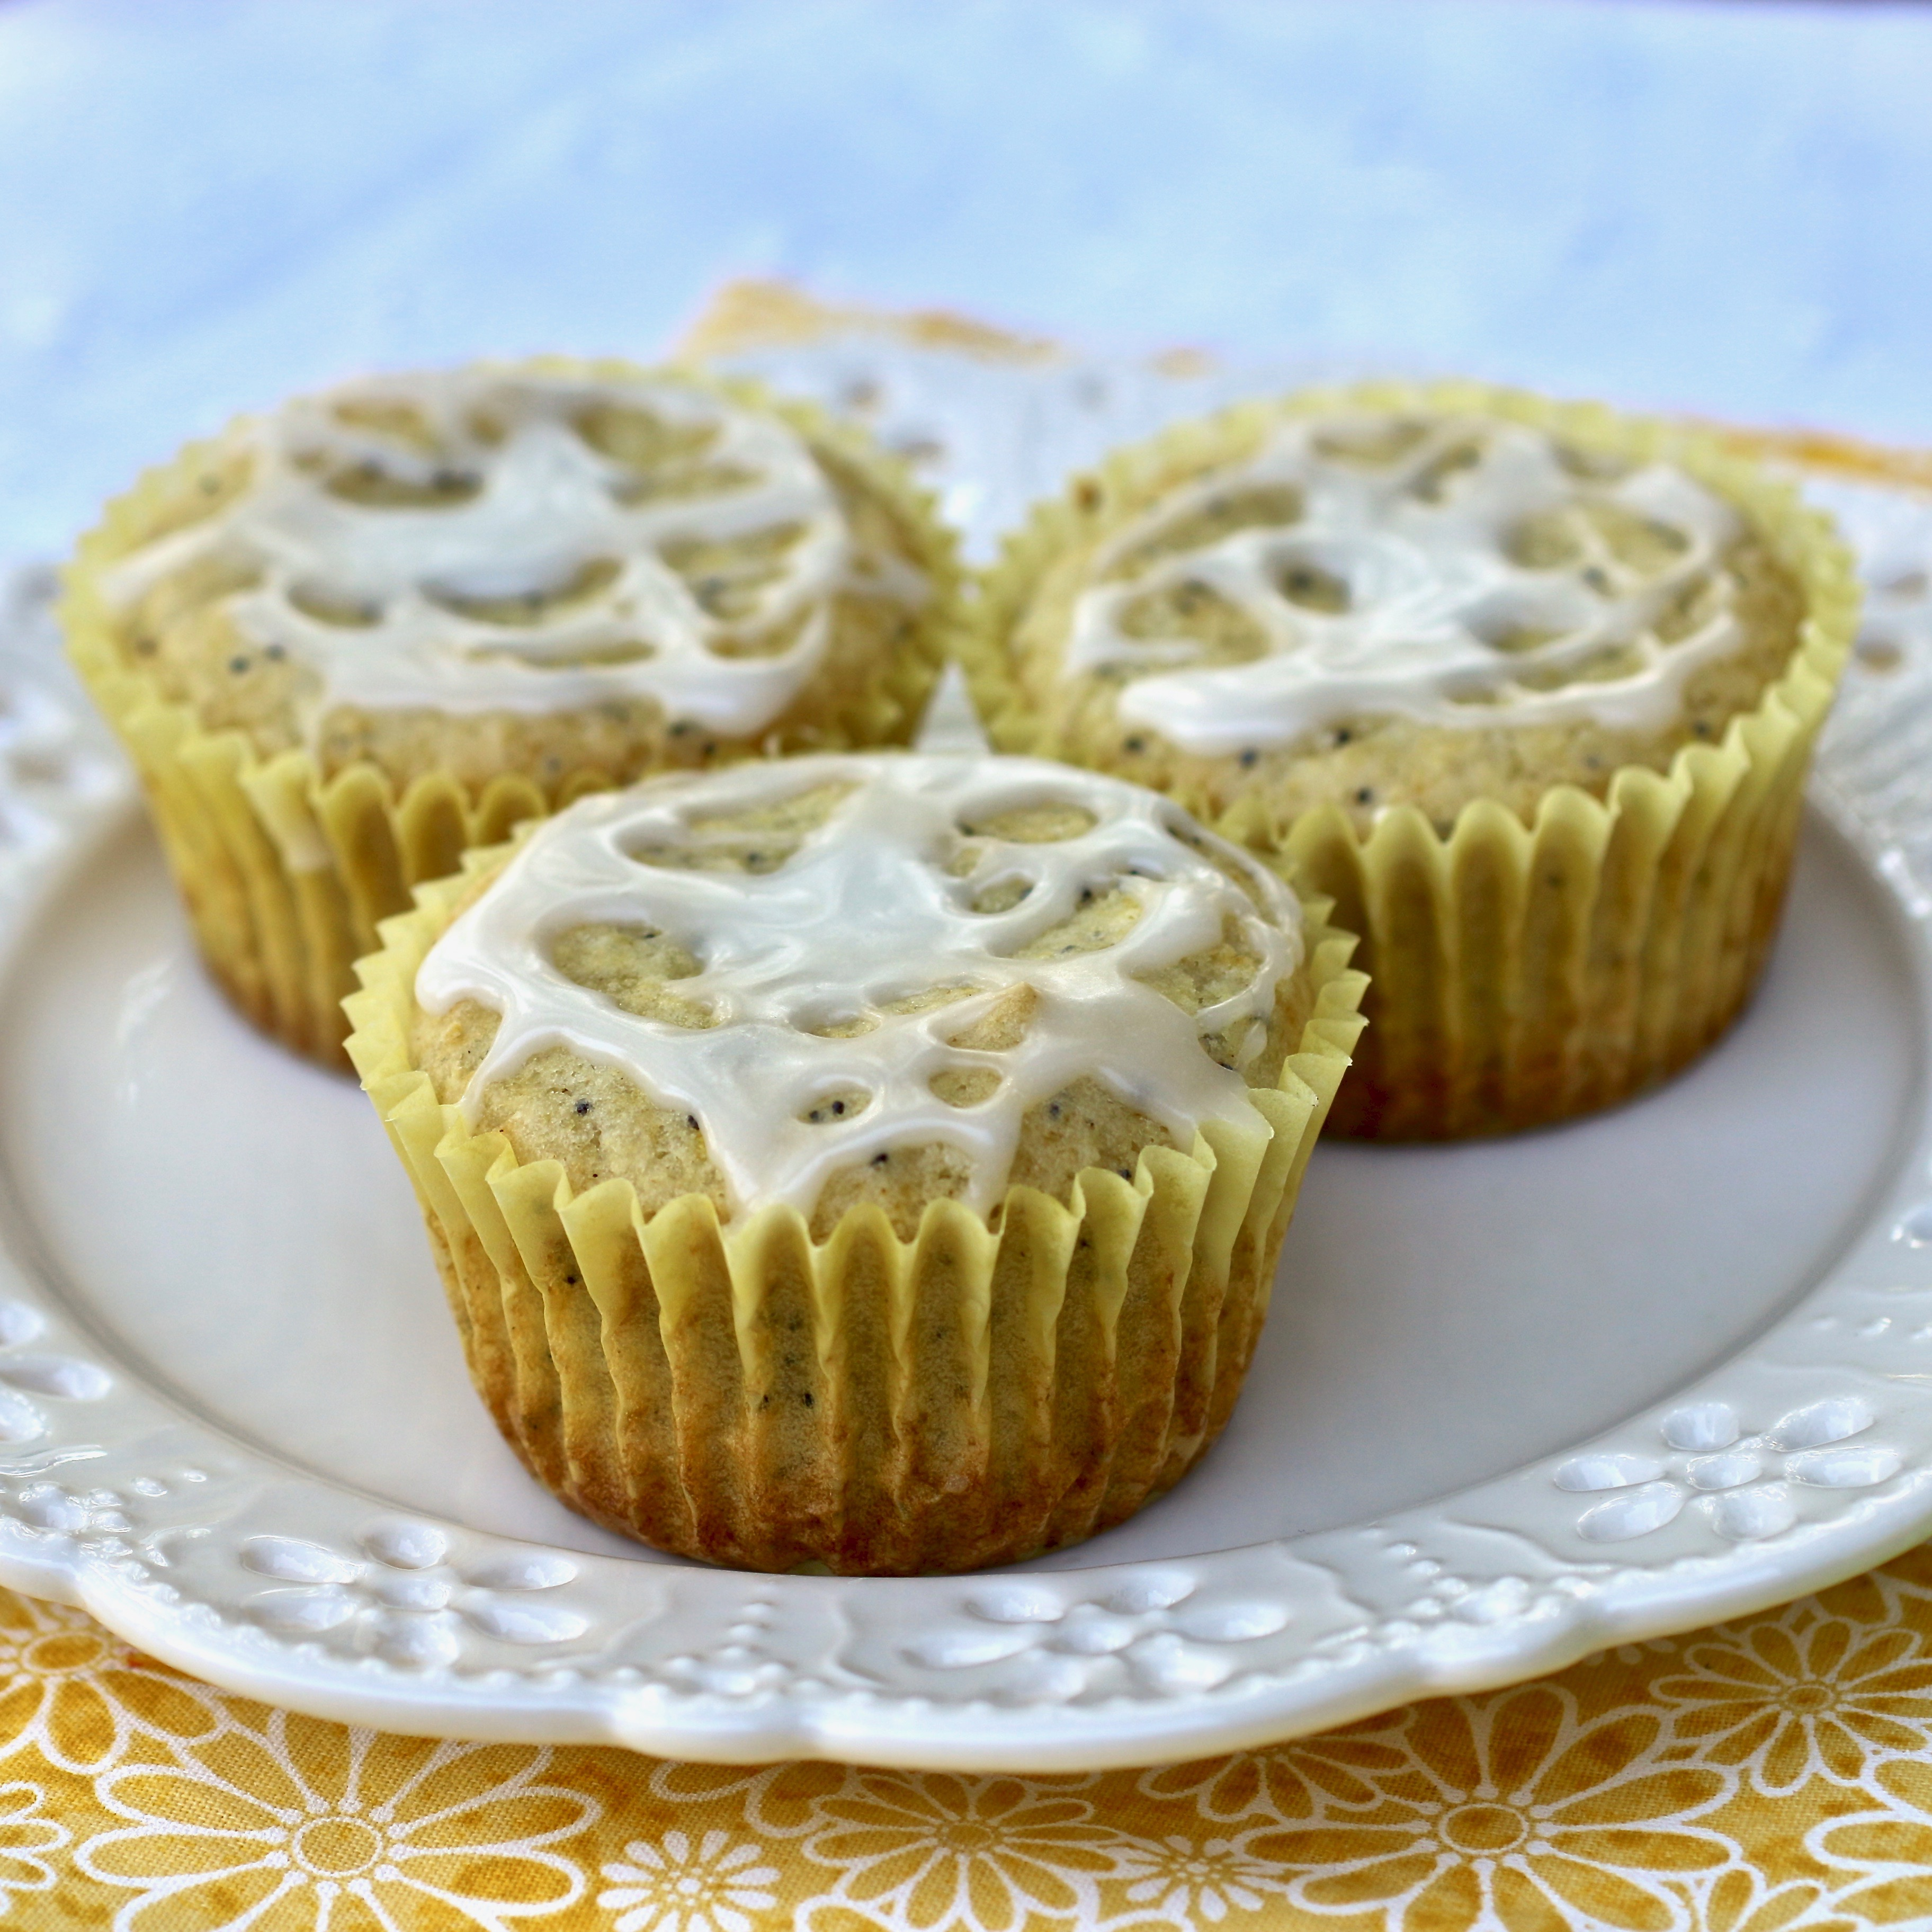 Vegan and Gluten-Free Lemon Poppy Seed Muffins